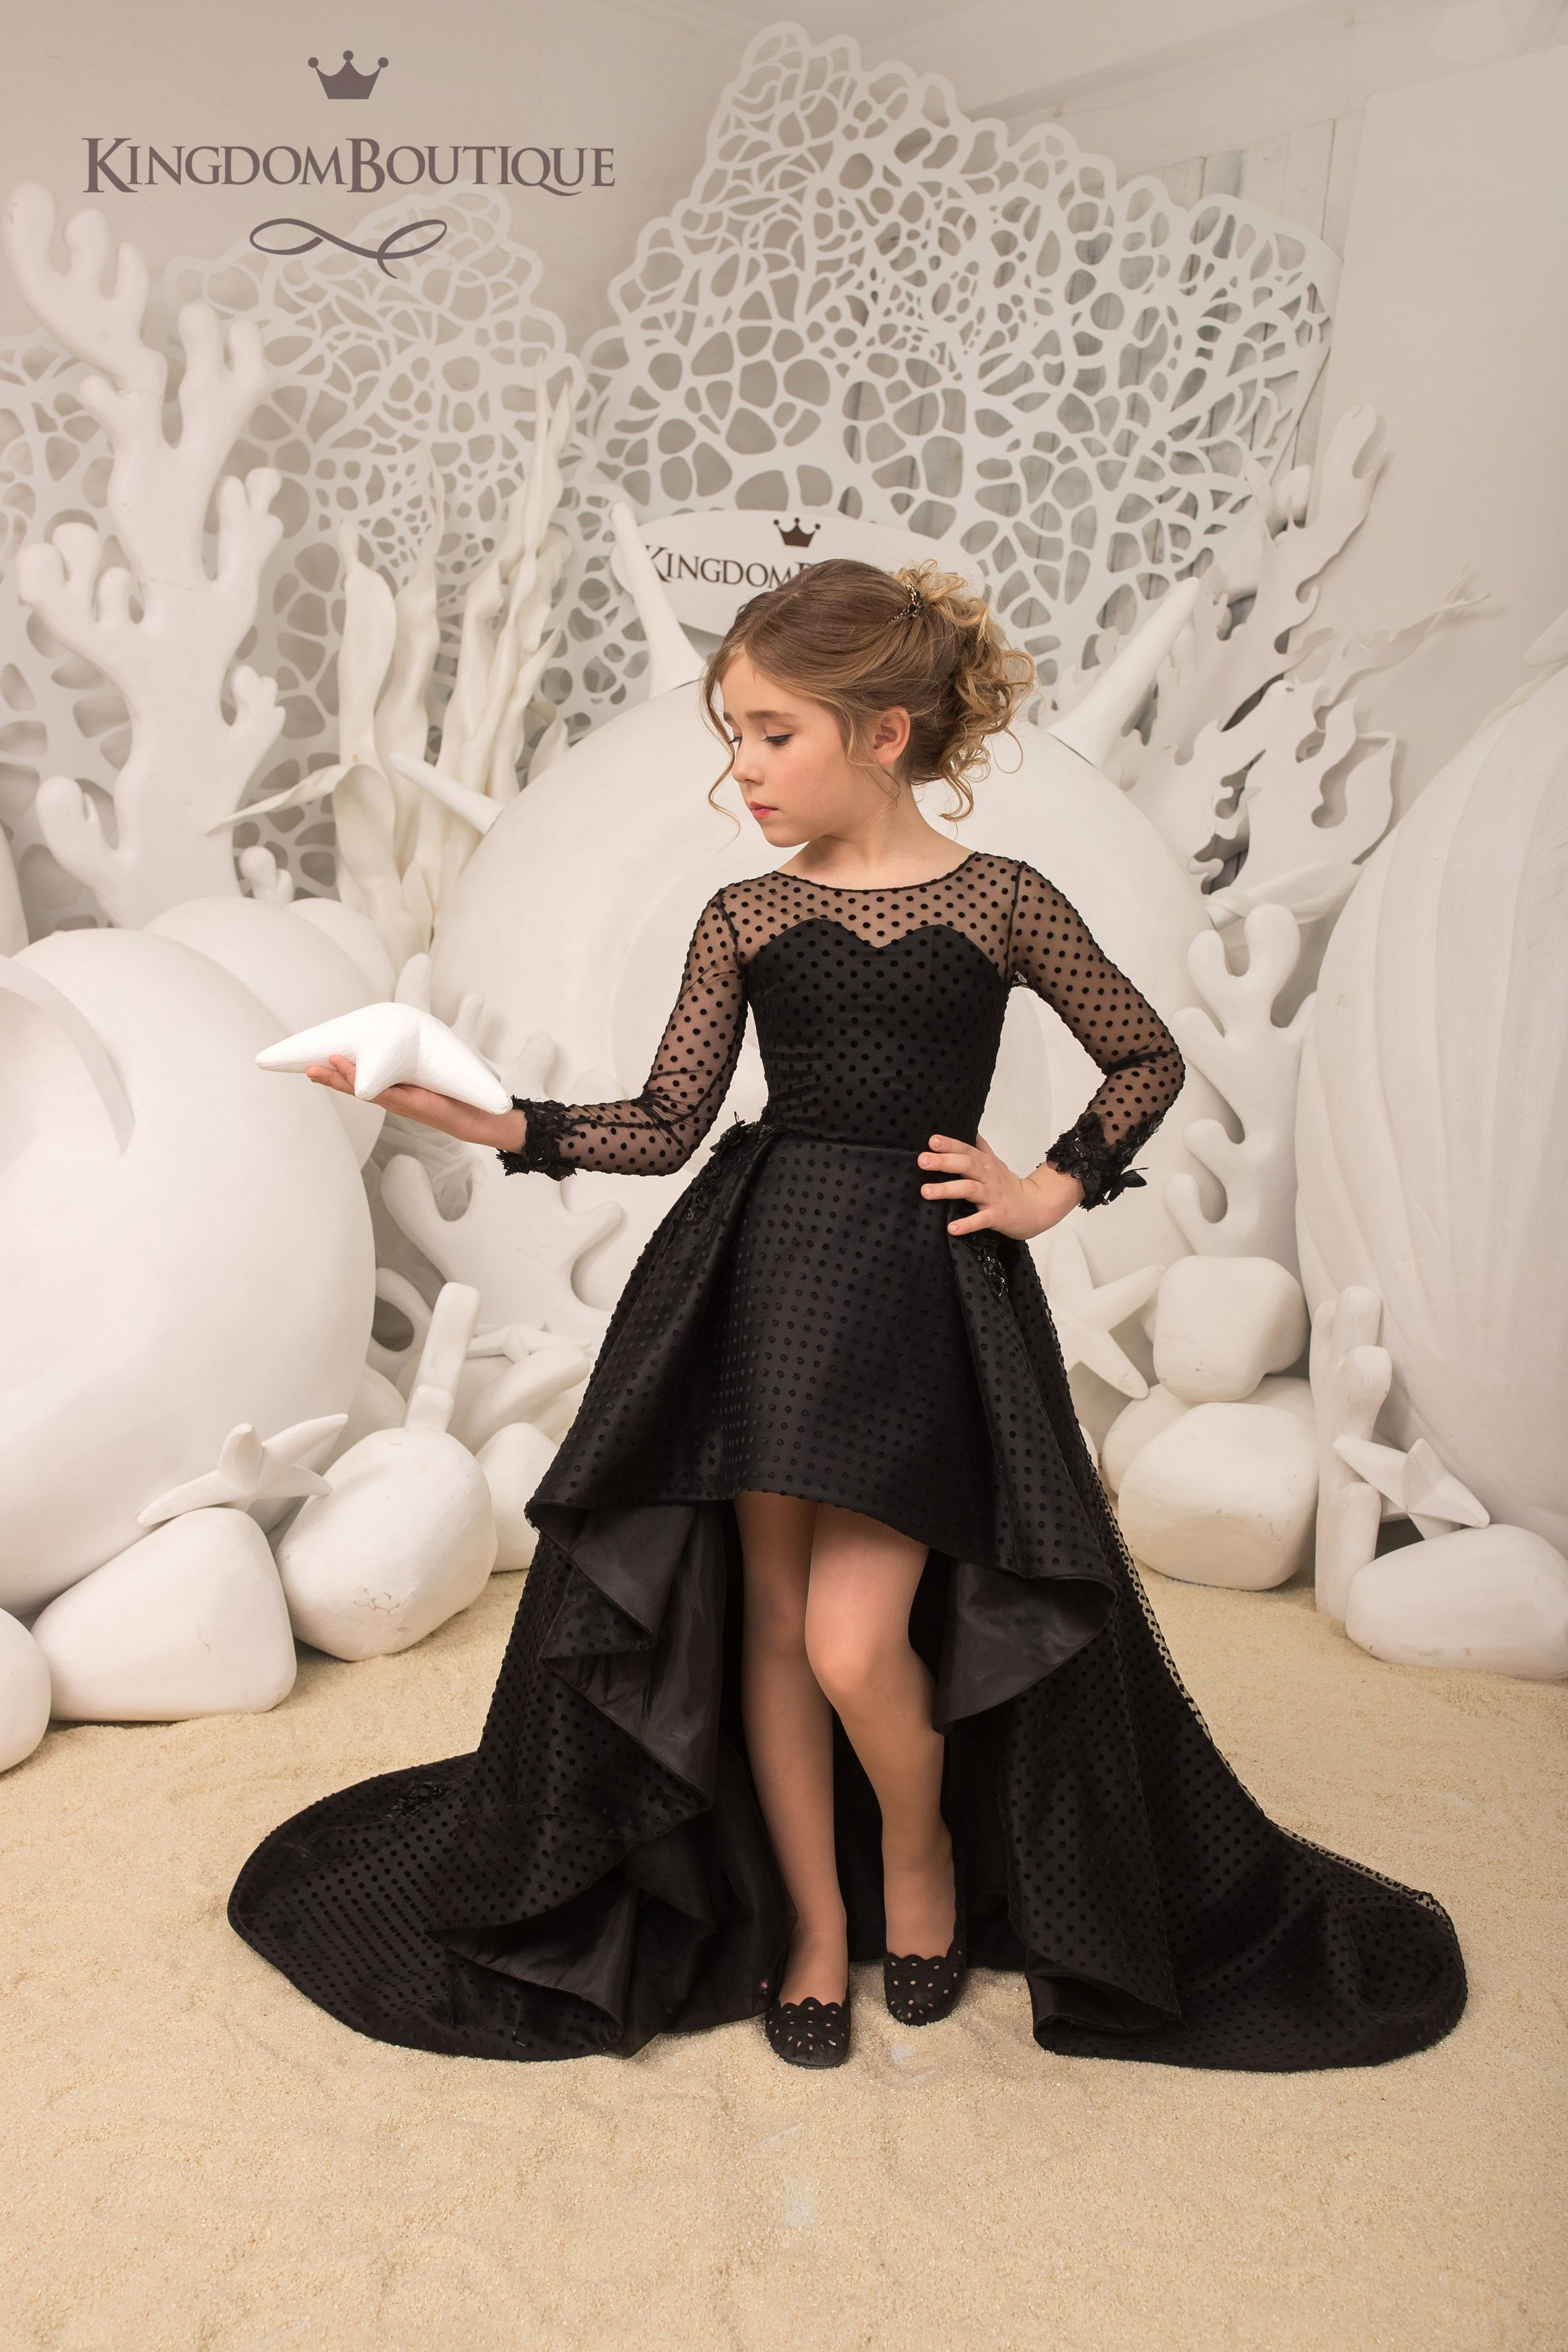 Coral Reef Nueva Kingdom Boutique Girls Black Dress Black Flower Girl Dress Flower Girl Dresses,Casual Pakistani Wedding Guest Dresses 2020